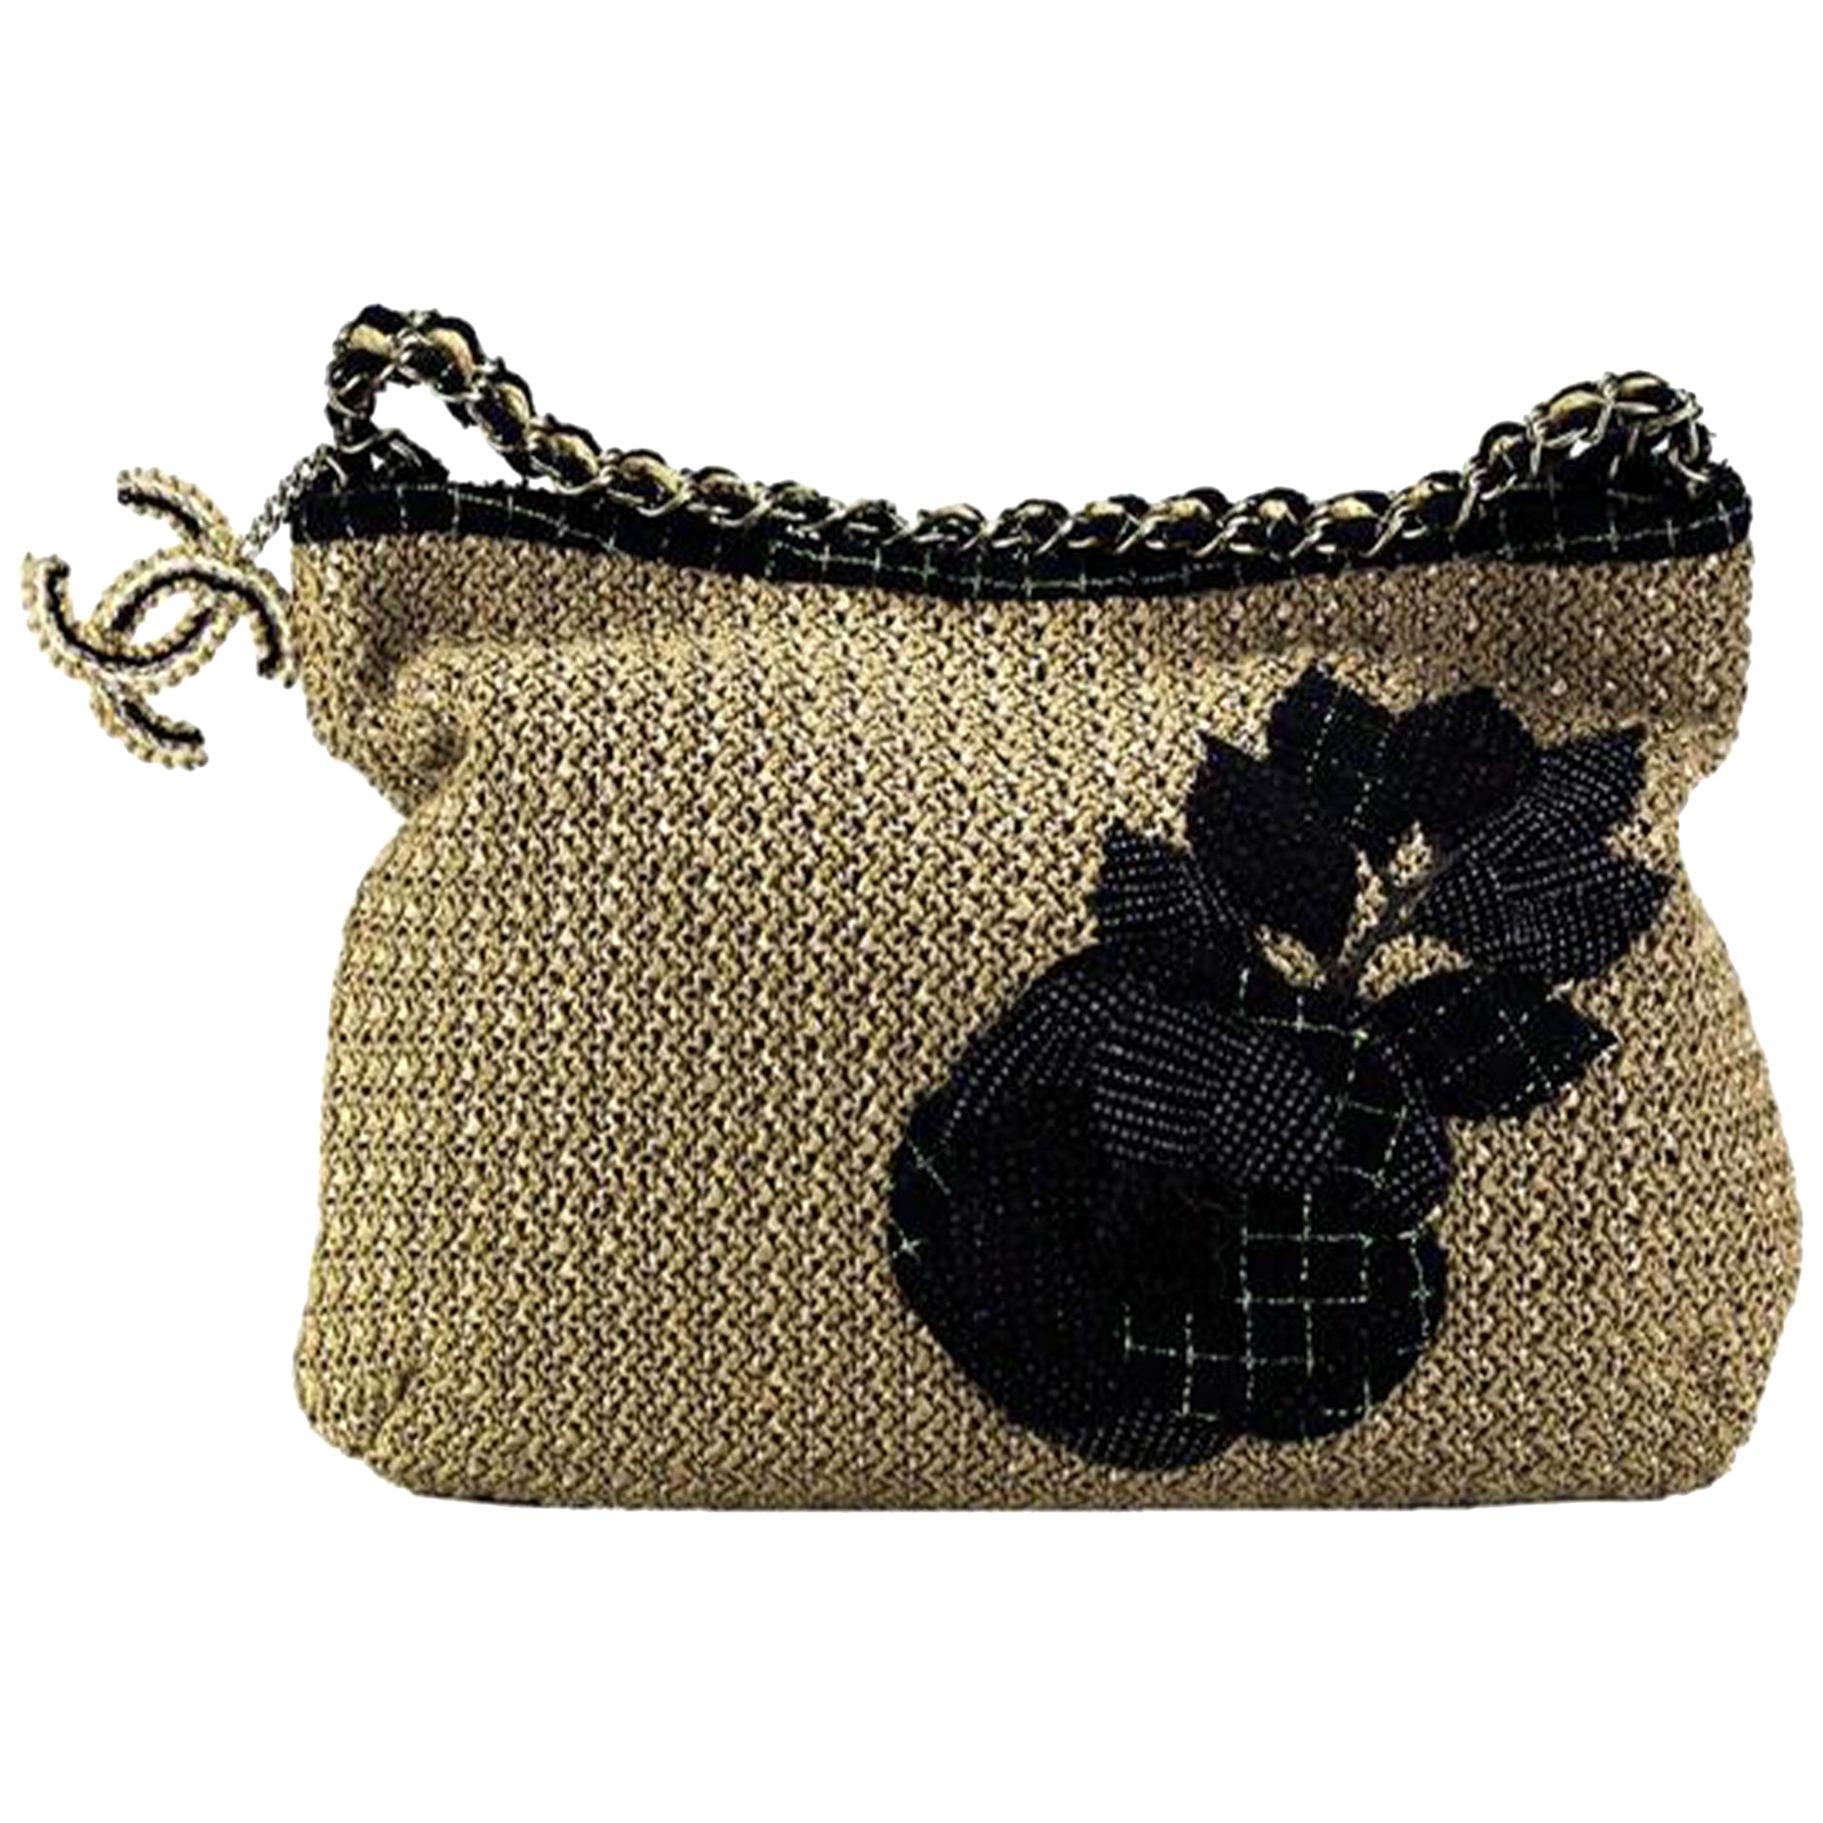 Chanel Organic Raffia Camelia Limited Edition Tote Beige Rope Shoulder Bag